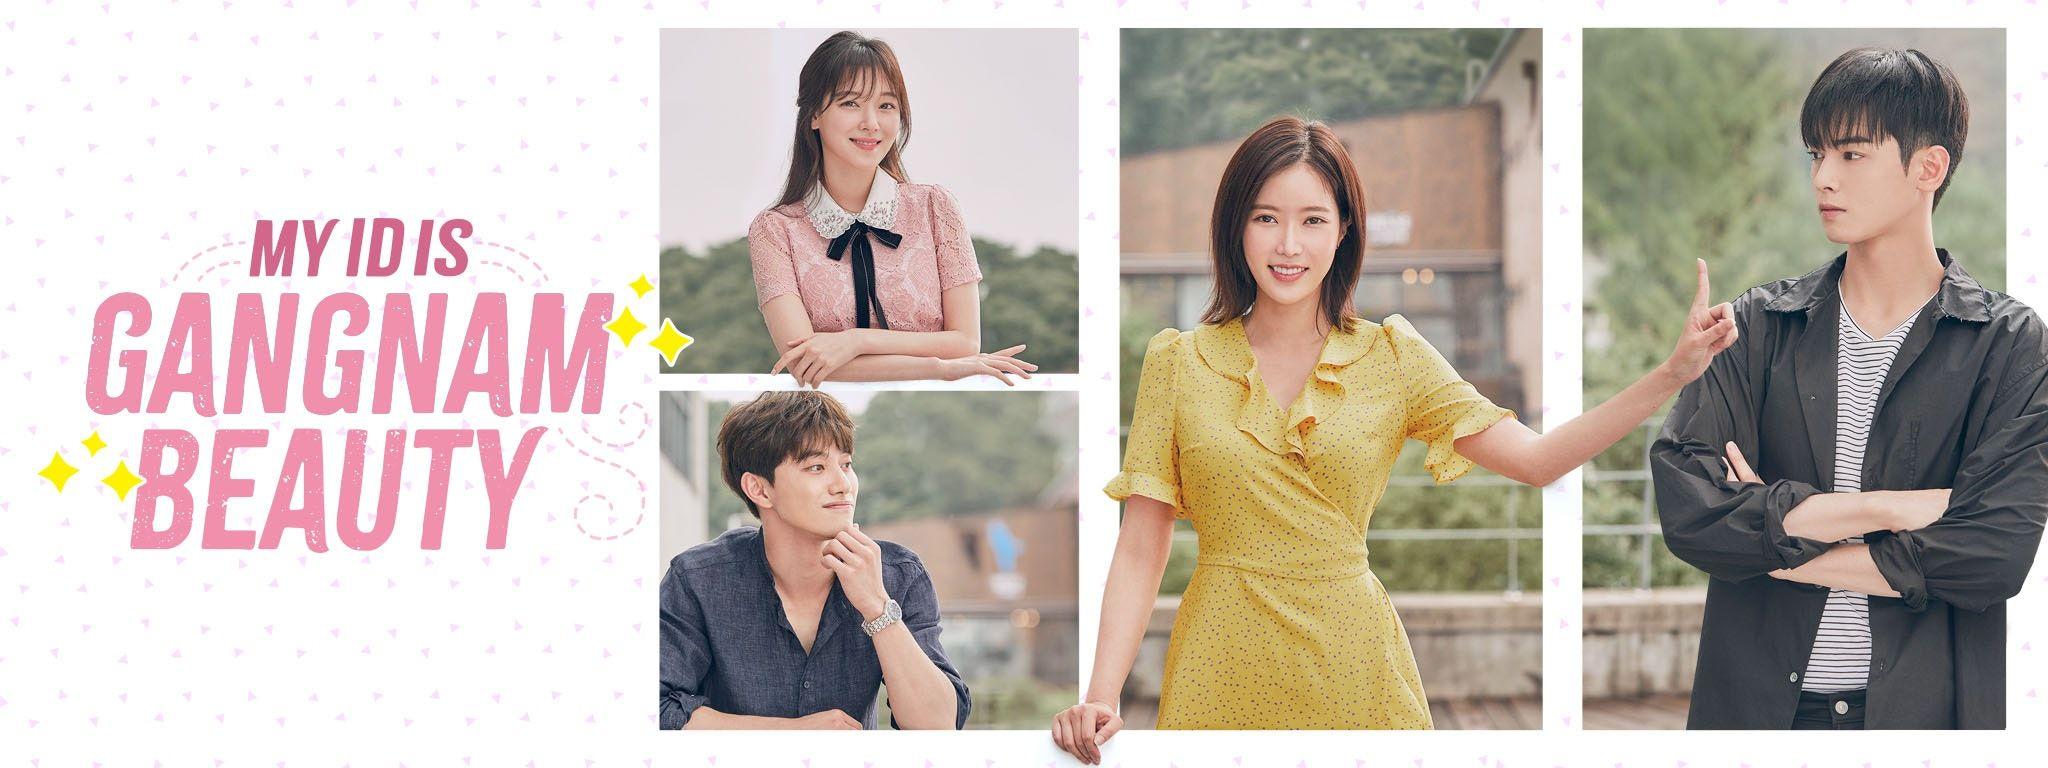 Pin De Lorena Solorzano En Doramas Cha Eun Woo Kdrama Familia Pobre Ver doramas mp4 online gratis en 720p hd y 1080p full hd. cha eun woo